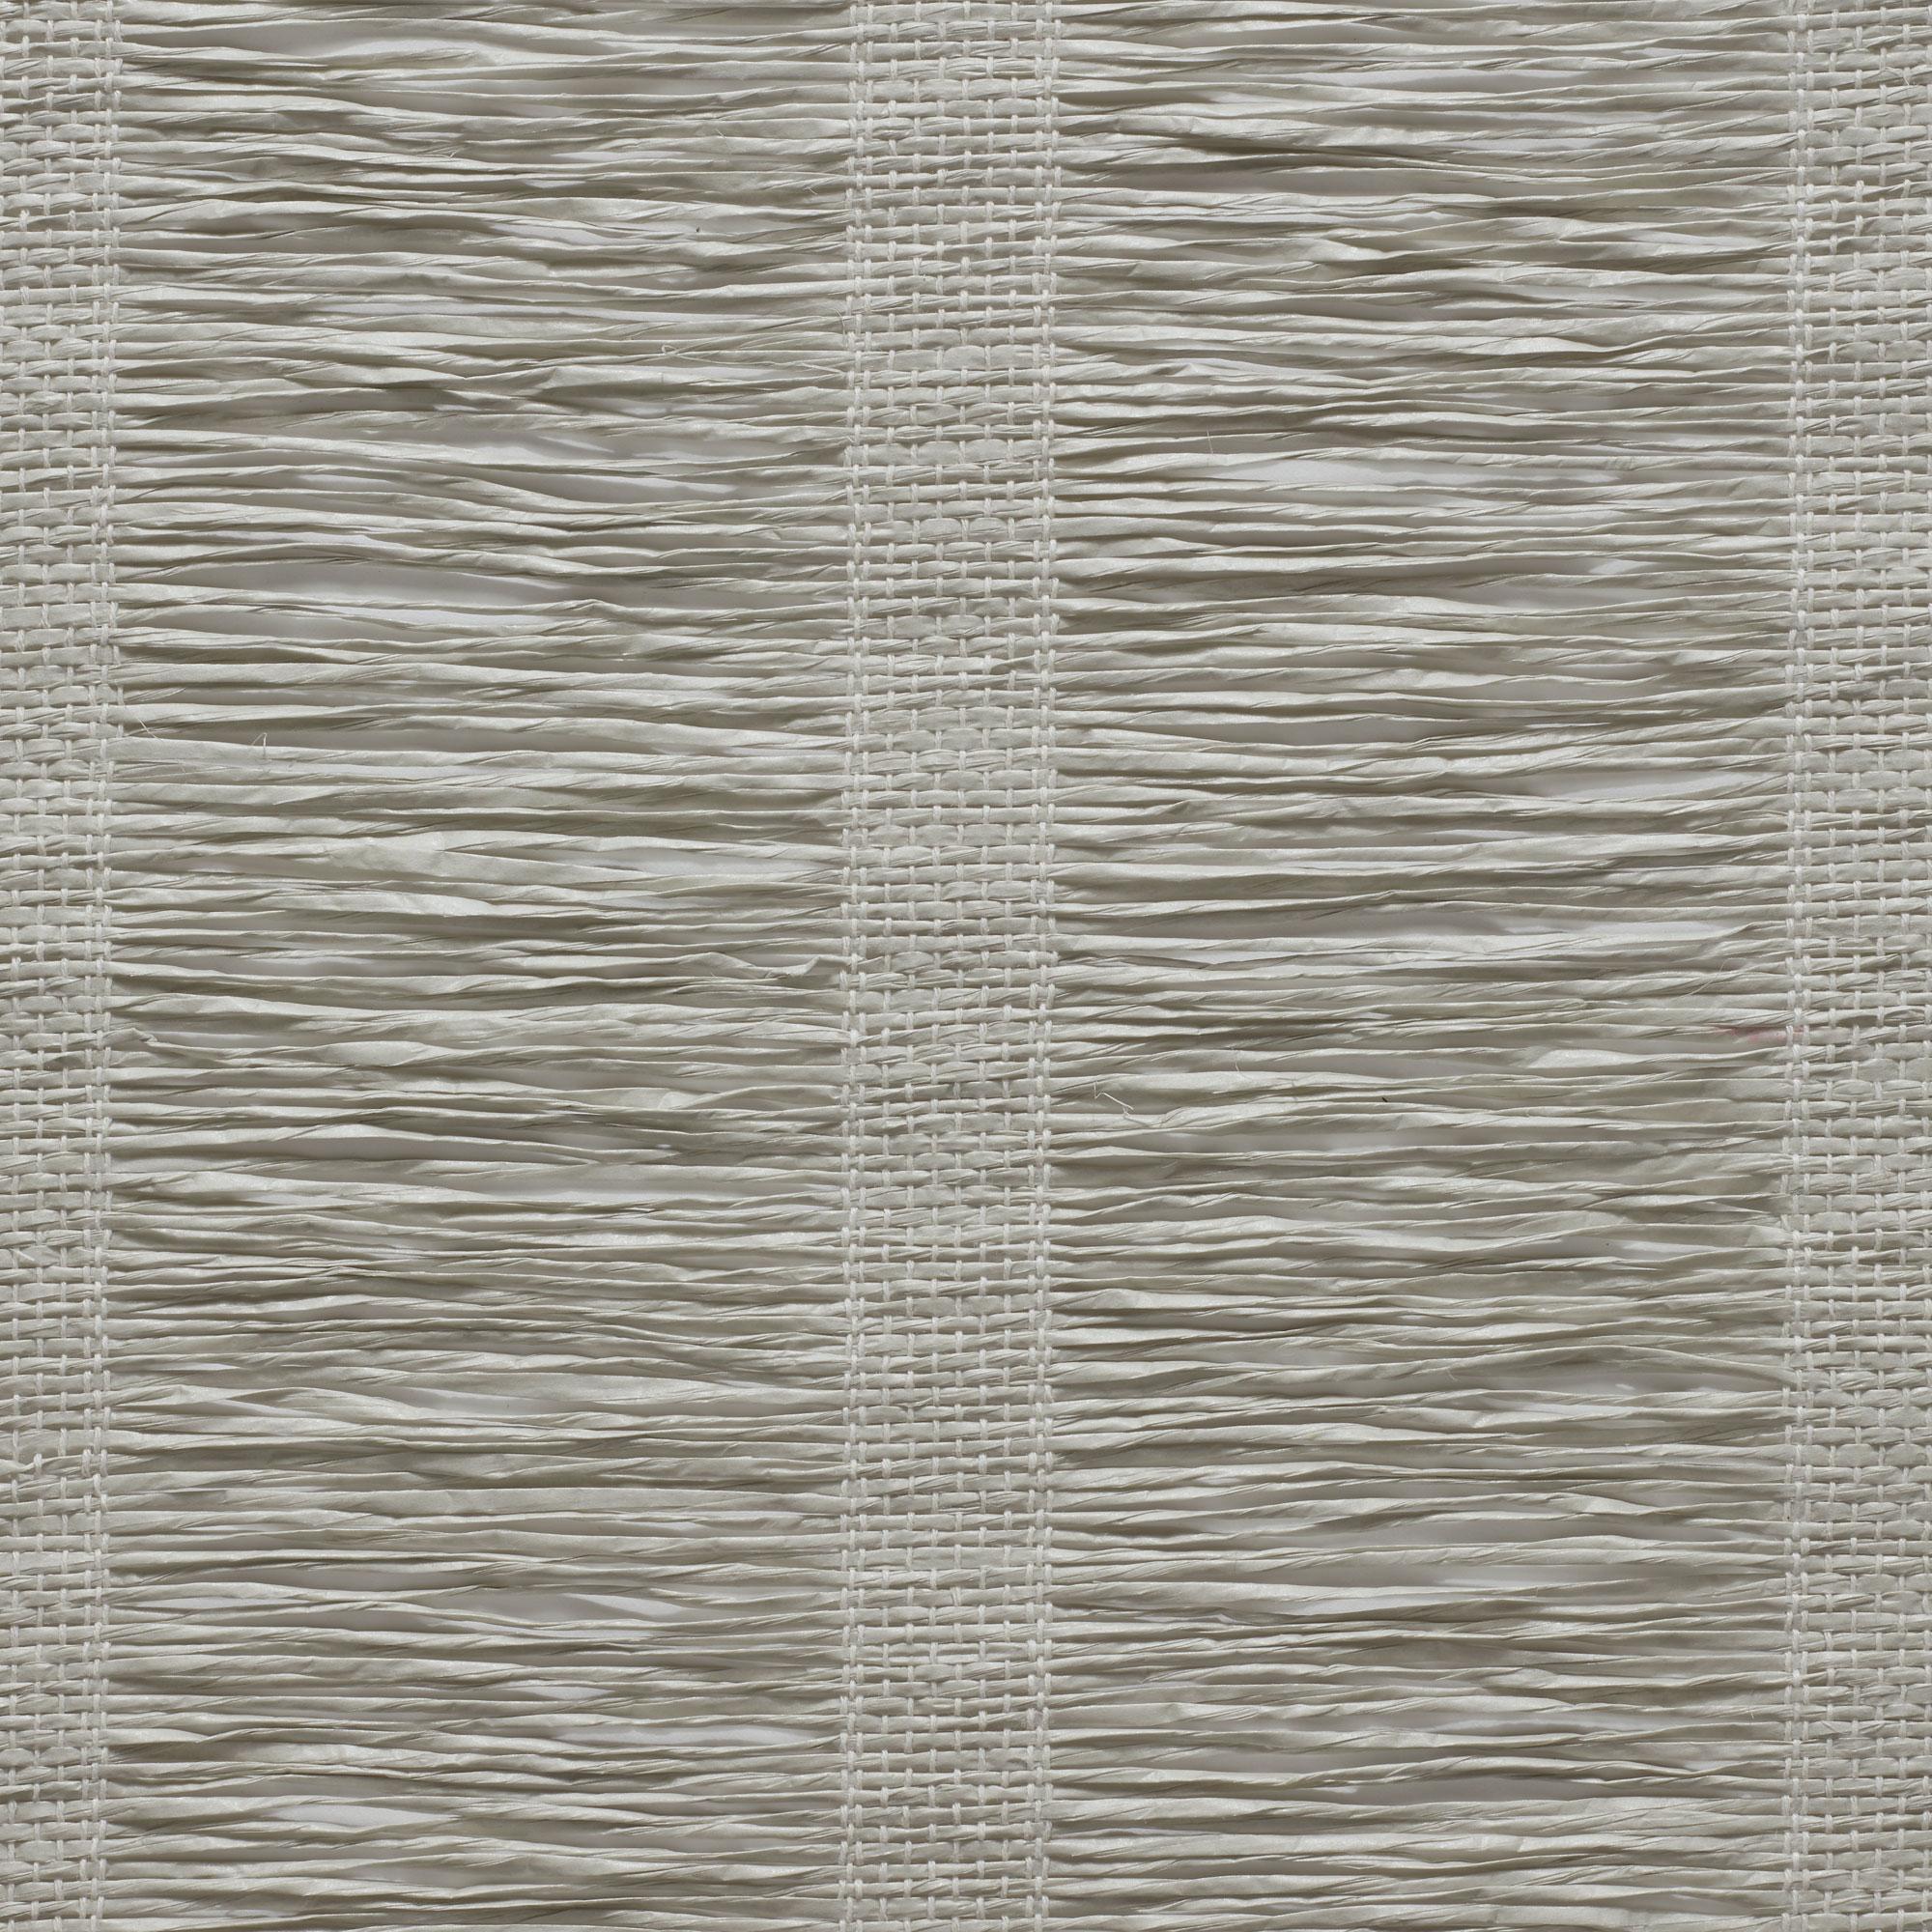 swatch-PE603-36-serenity-sulky-grey-web.jpg